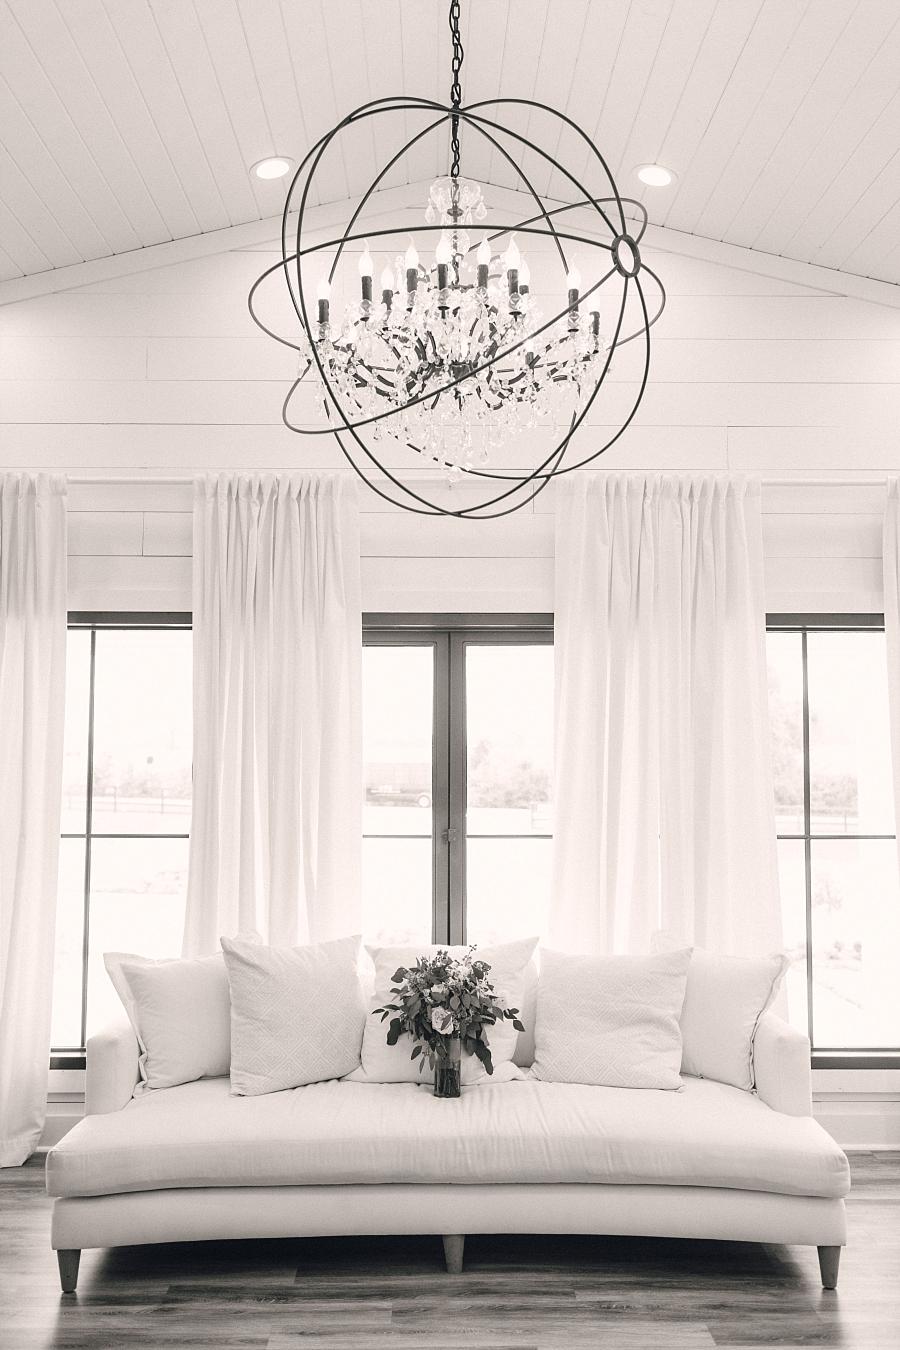 Stacy-Anderson-Photography-The-Farmhouse-Houston-Wedding-Photographer_0050.jpg